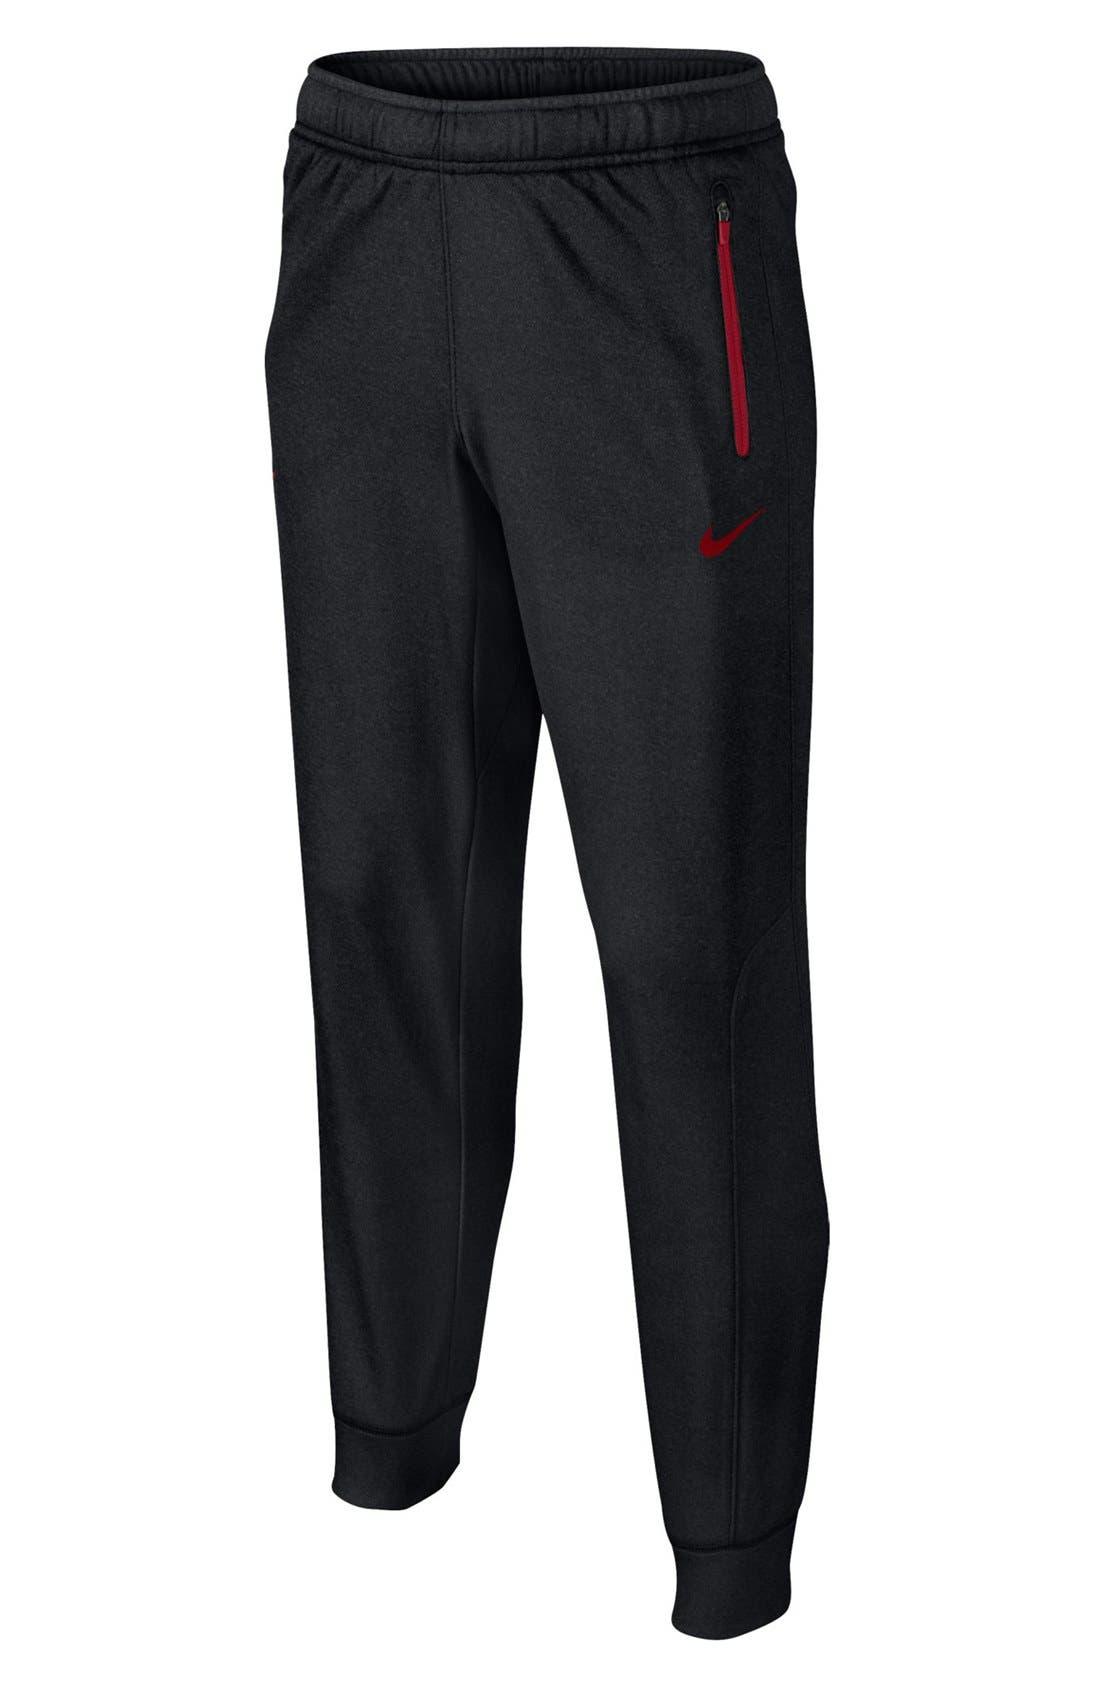 Alternate Image 1 Selected - Nike 'LeBron Performance Hero' Dri-FIT Pants (Big Boys)